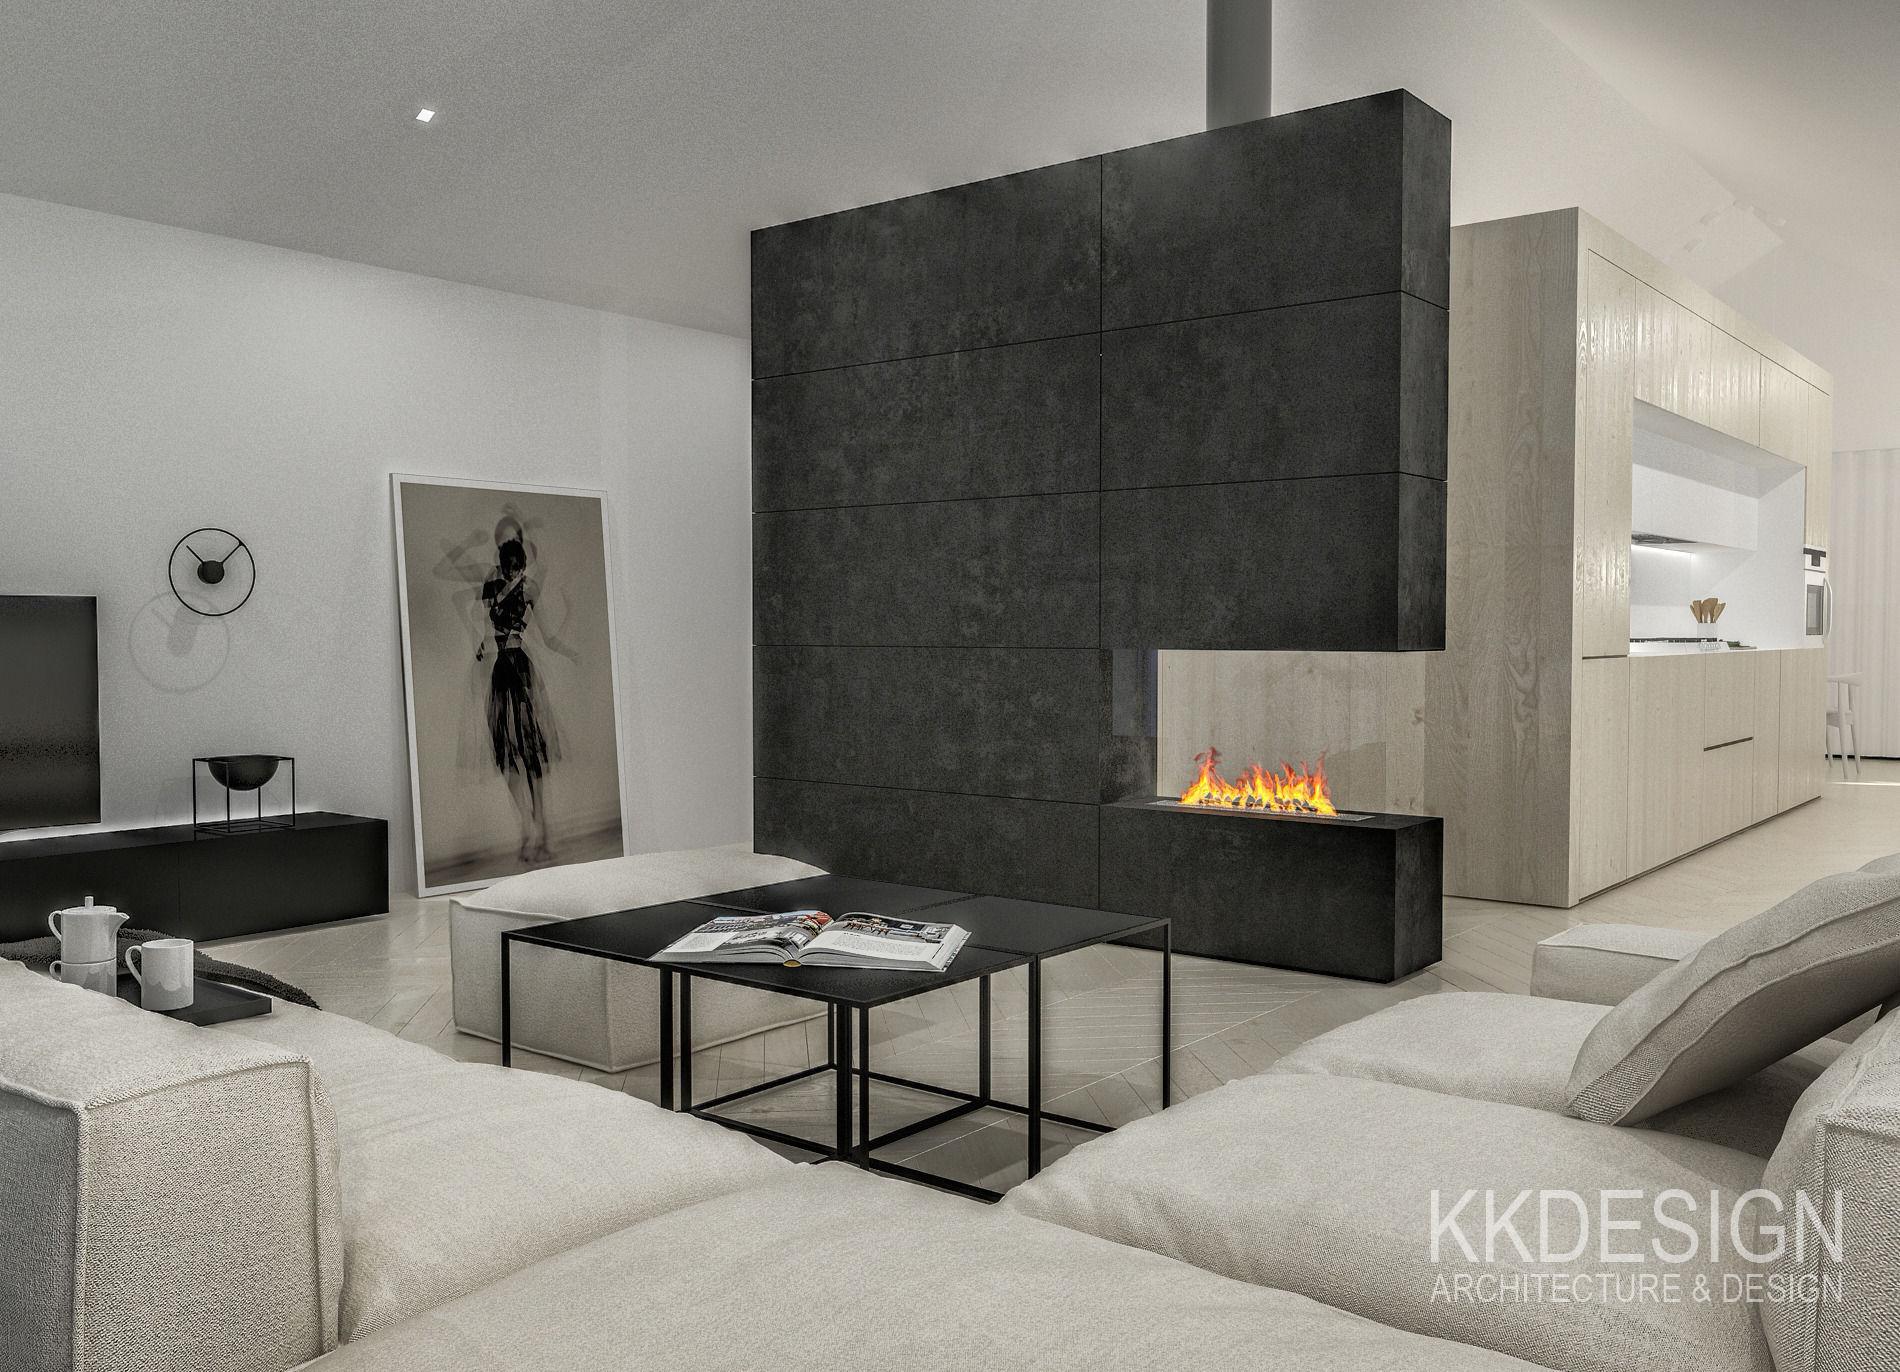 100+ [ Home Design Architecture ] | Architectural Floor Plan Image ...